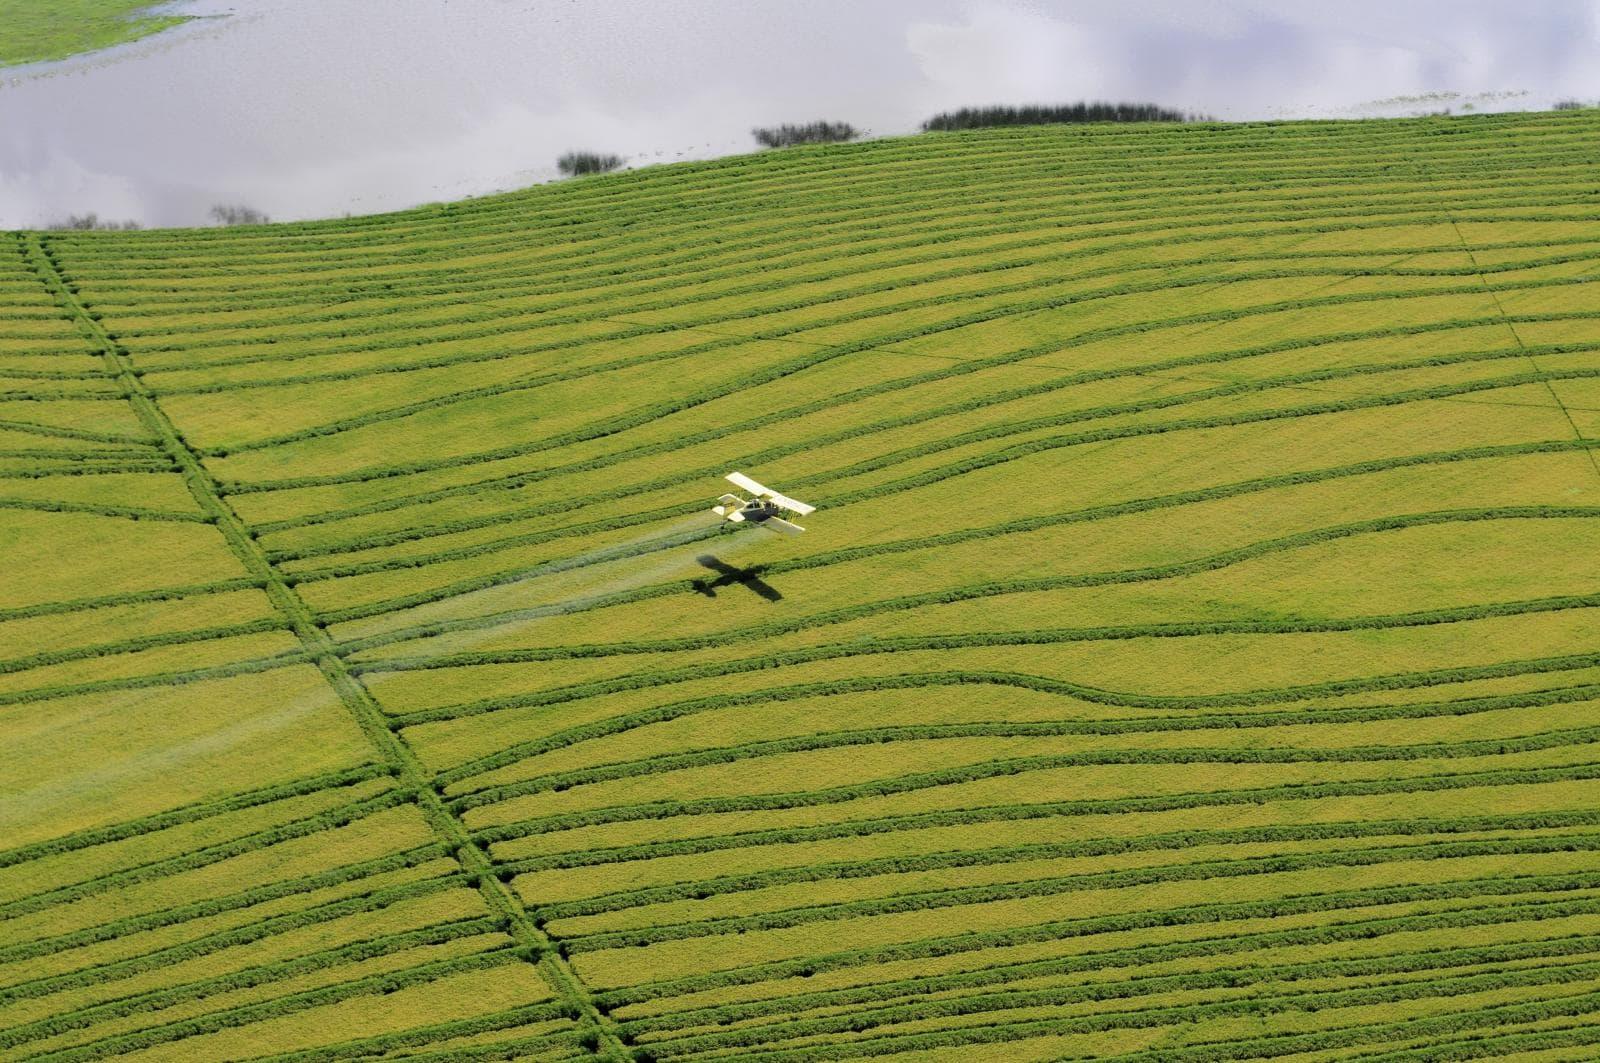 Wheat Uruguay. CIAT/N. Palmer